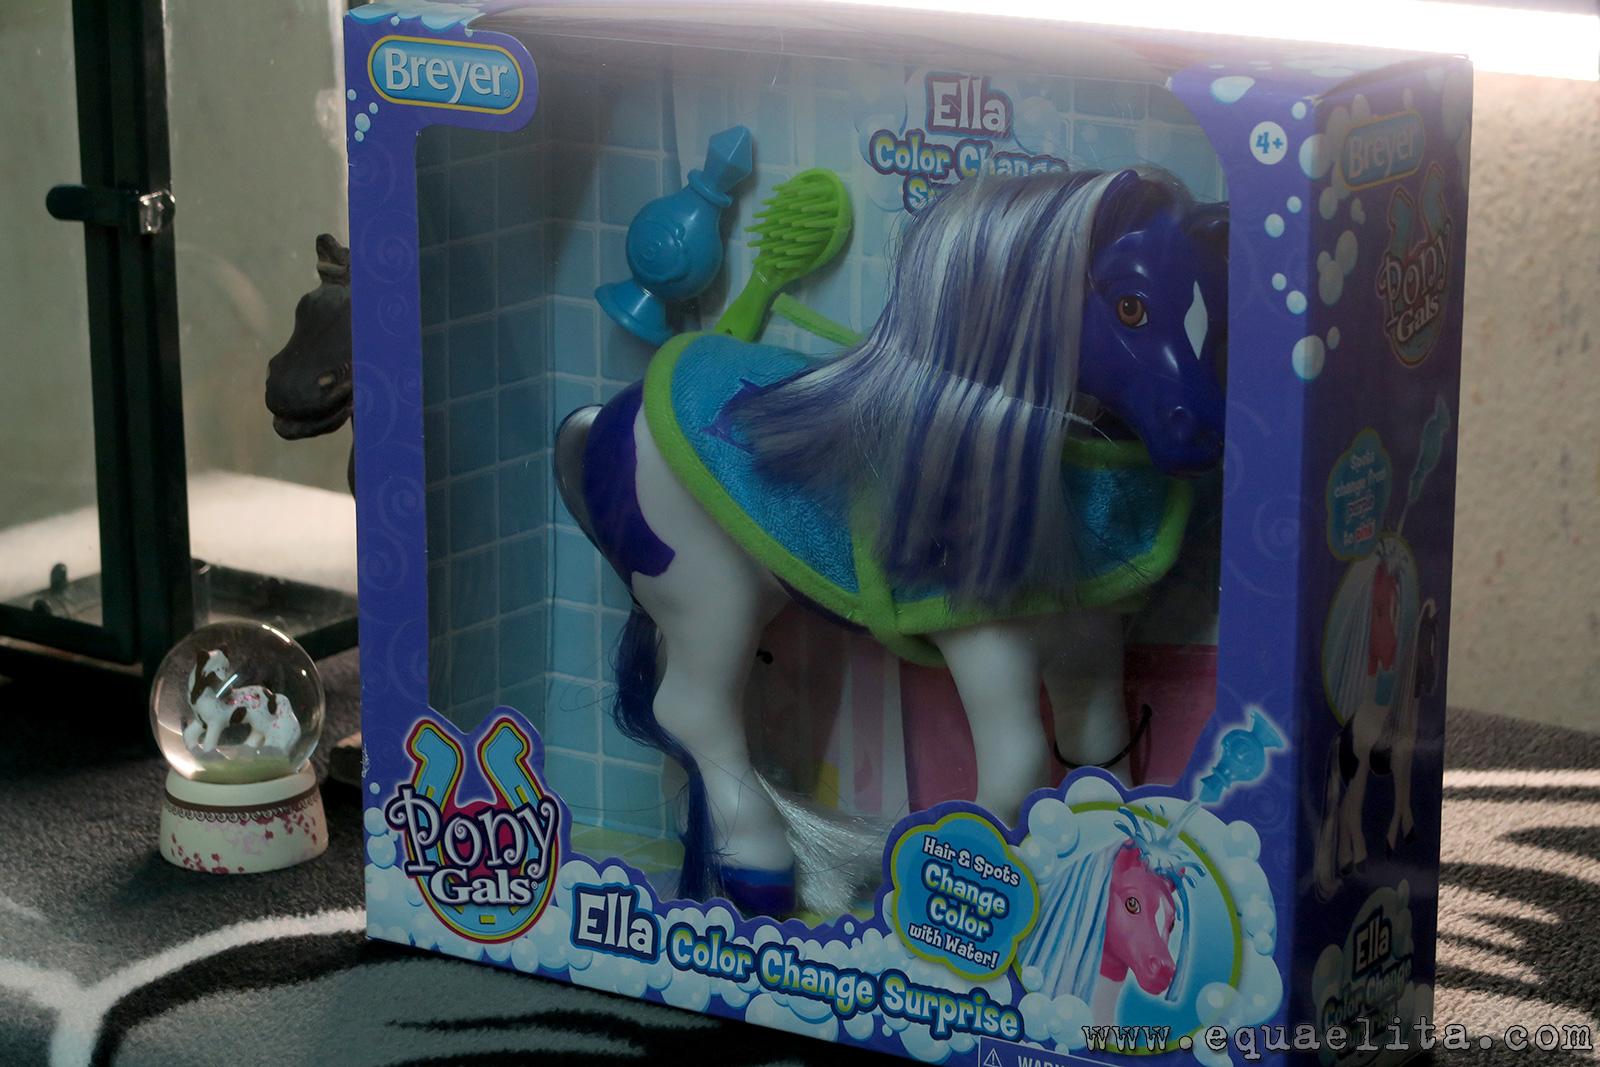 Breyer Pony Gals Ella No. 7107 - коробка